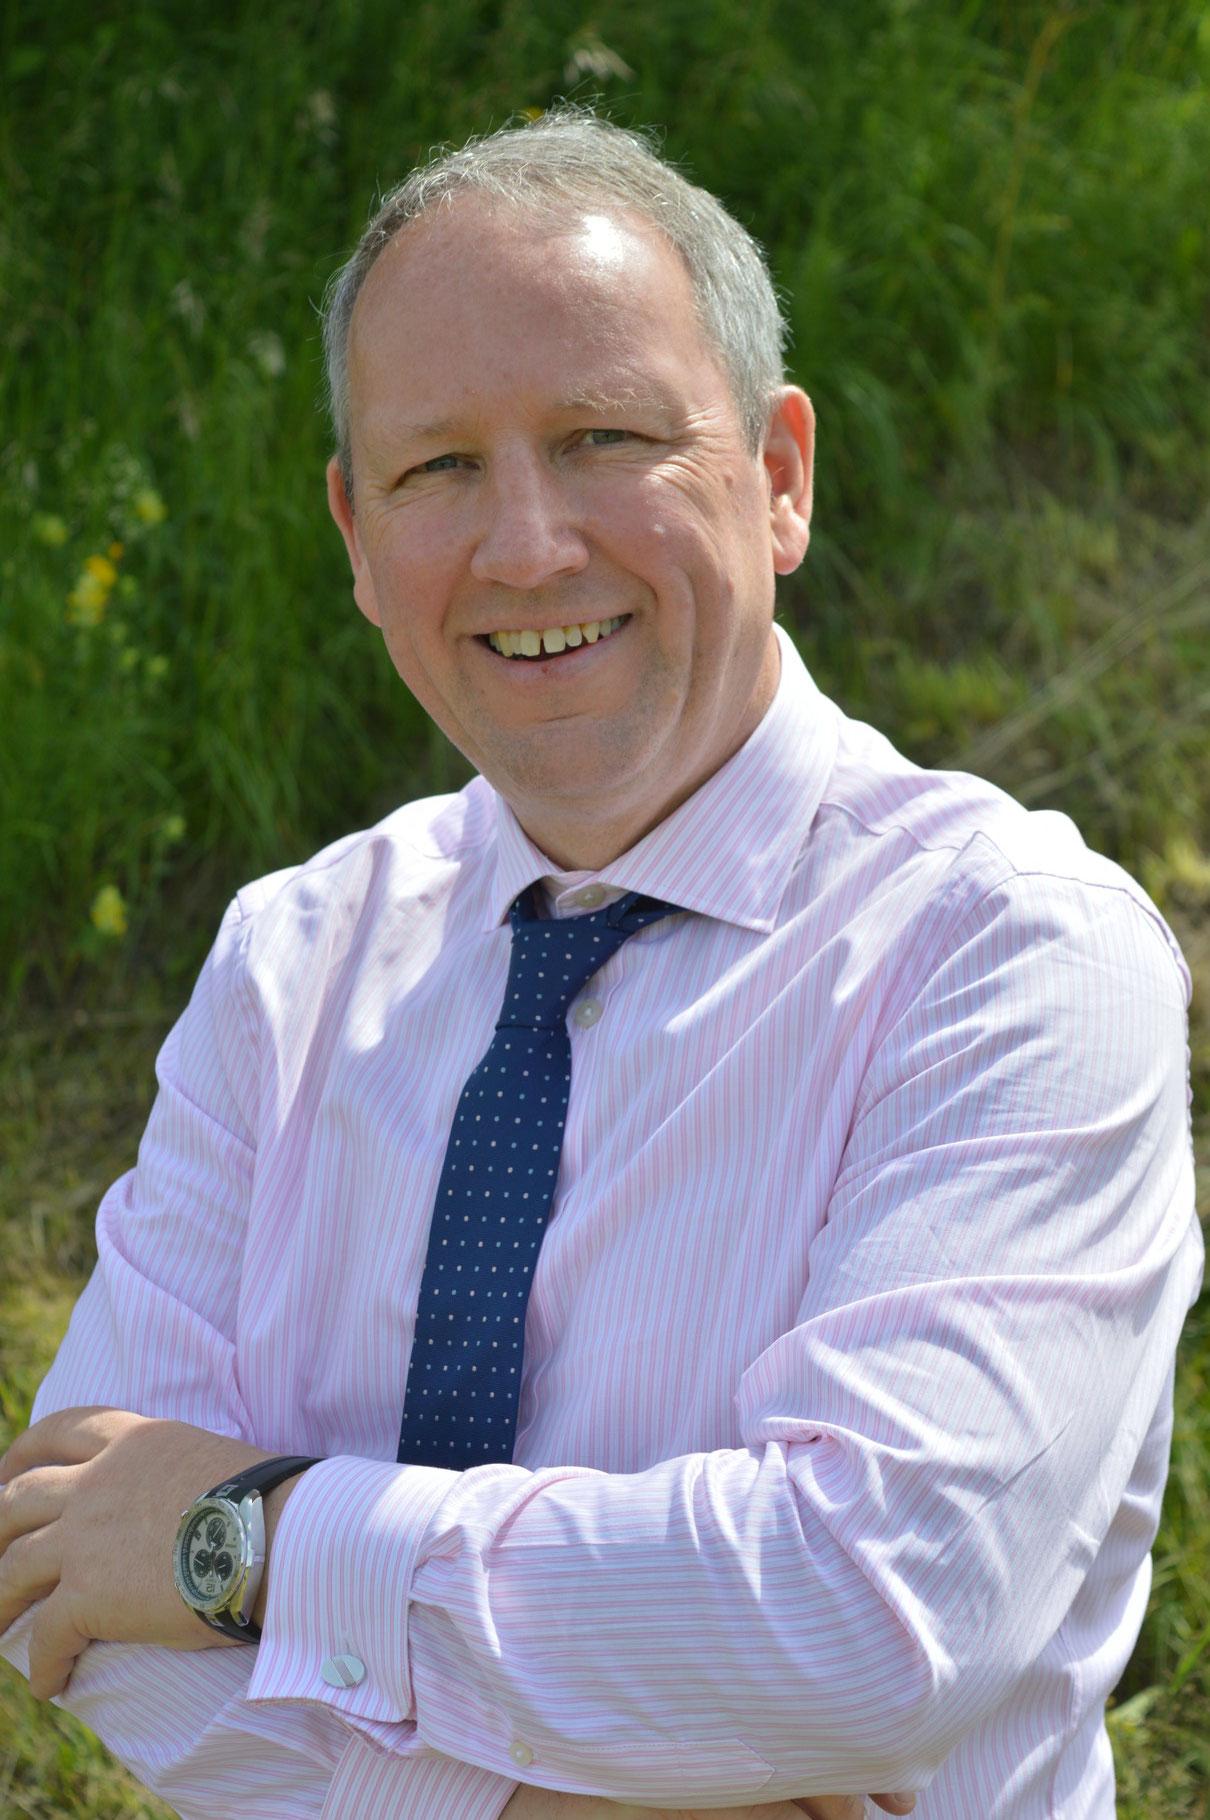 Minister Bill Thomson